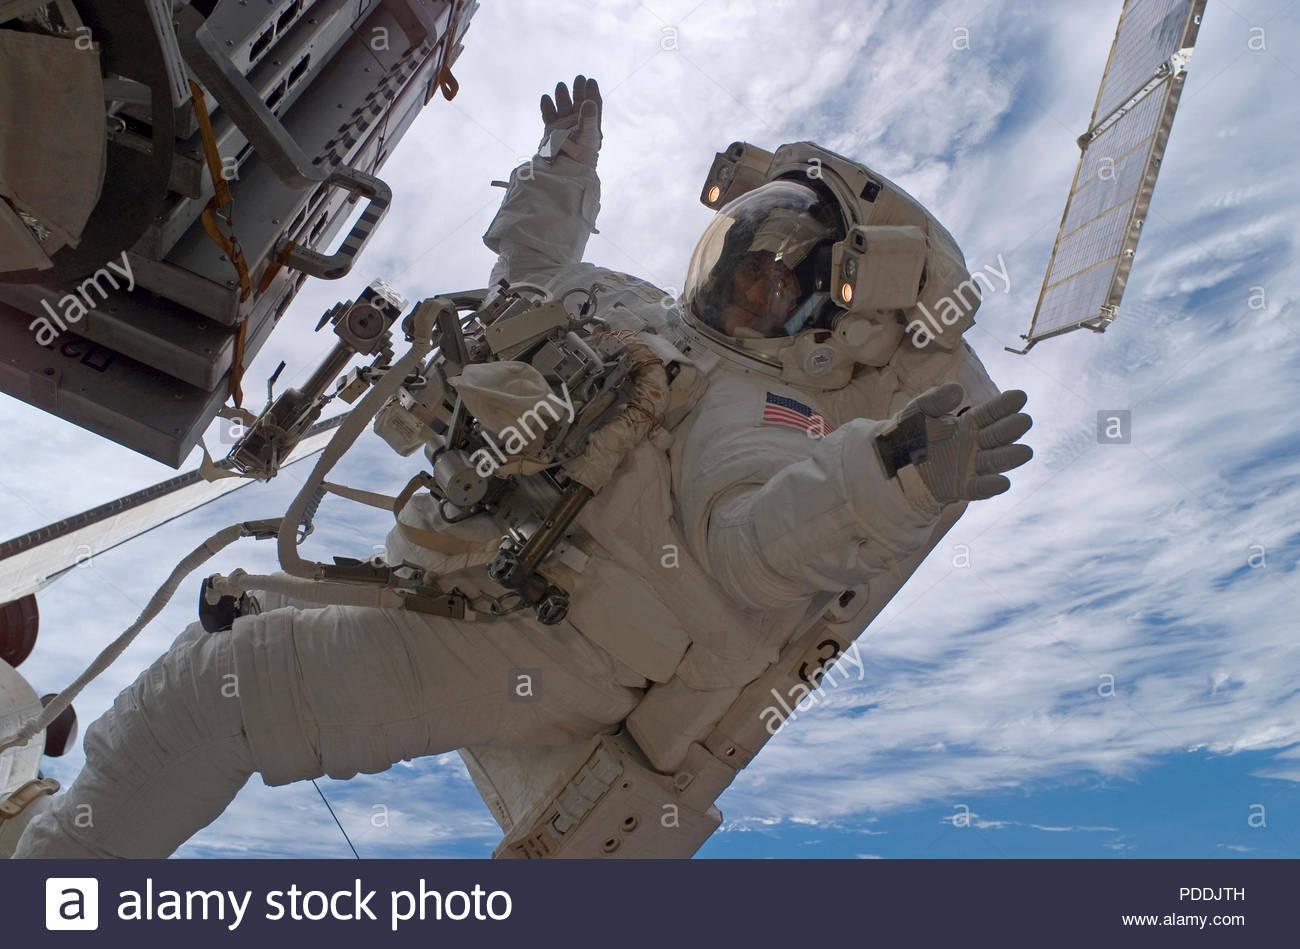 Female Astronaut Nasa Imágenes De Stock & Female Astronaut Nasa ...